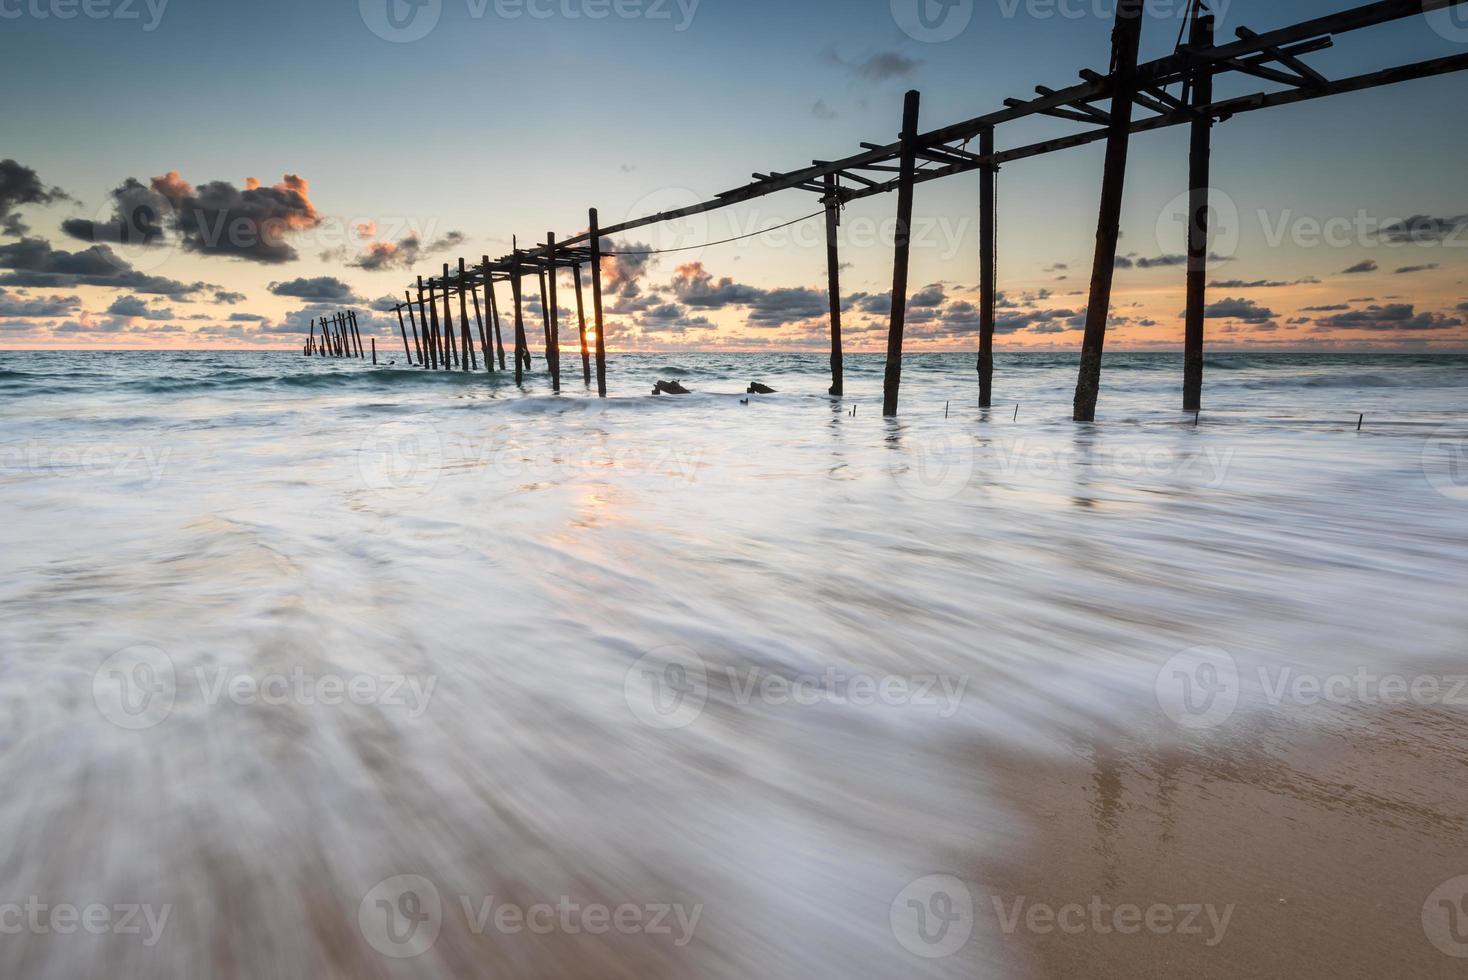 impacto das ondas do mar na areia da praia foto